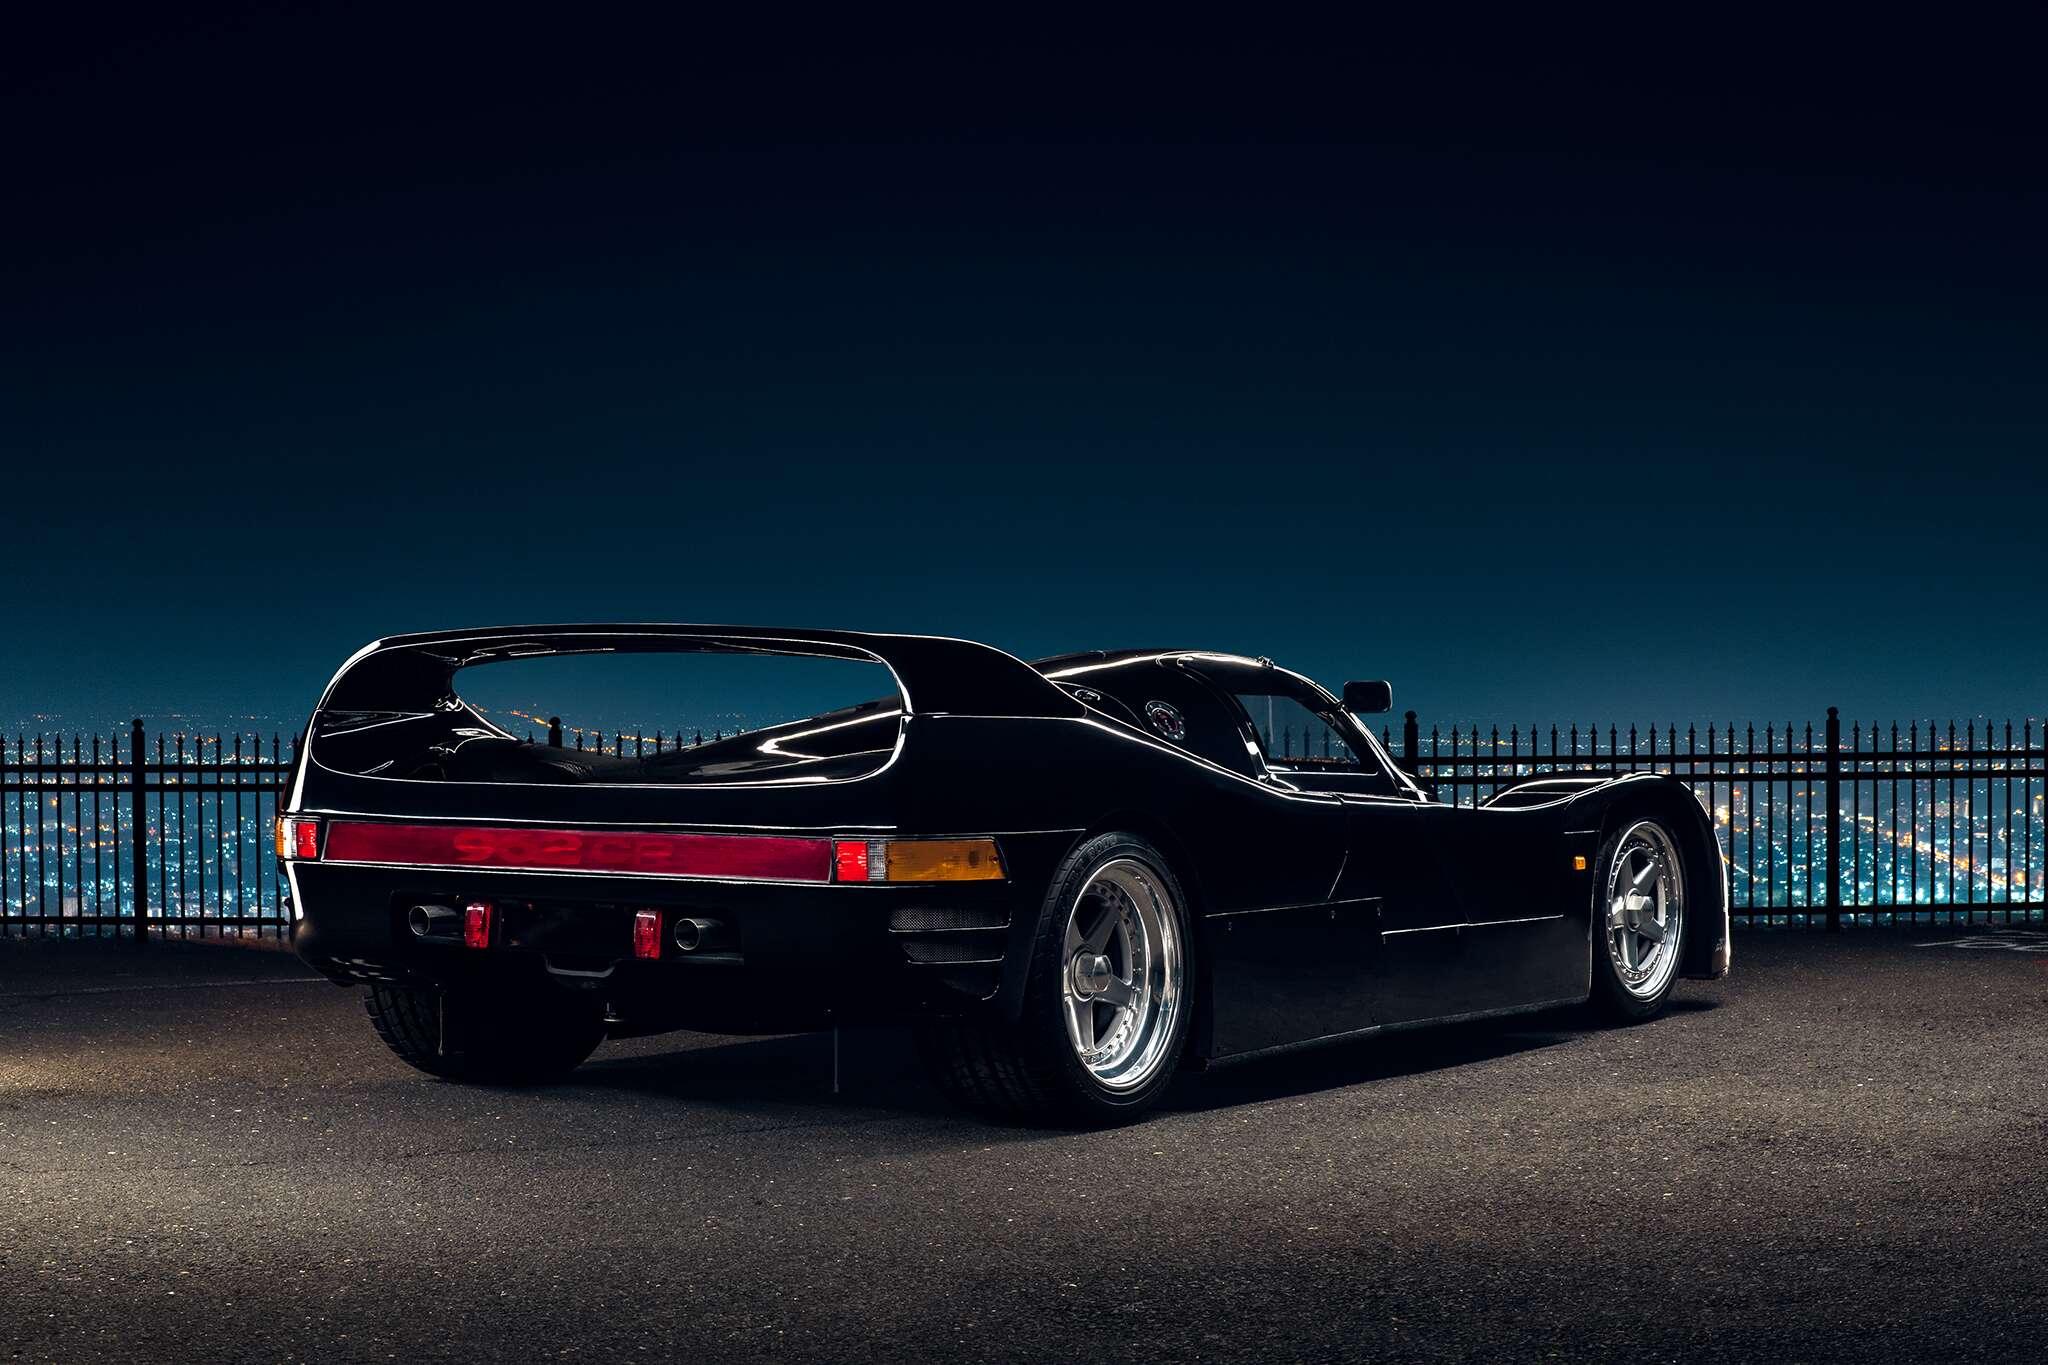 This 1-of-6, Zero-Mile, Street-Legal Schuppan Porsche 962CR Is ...